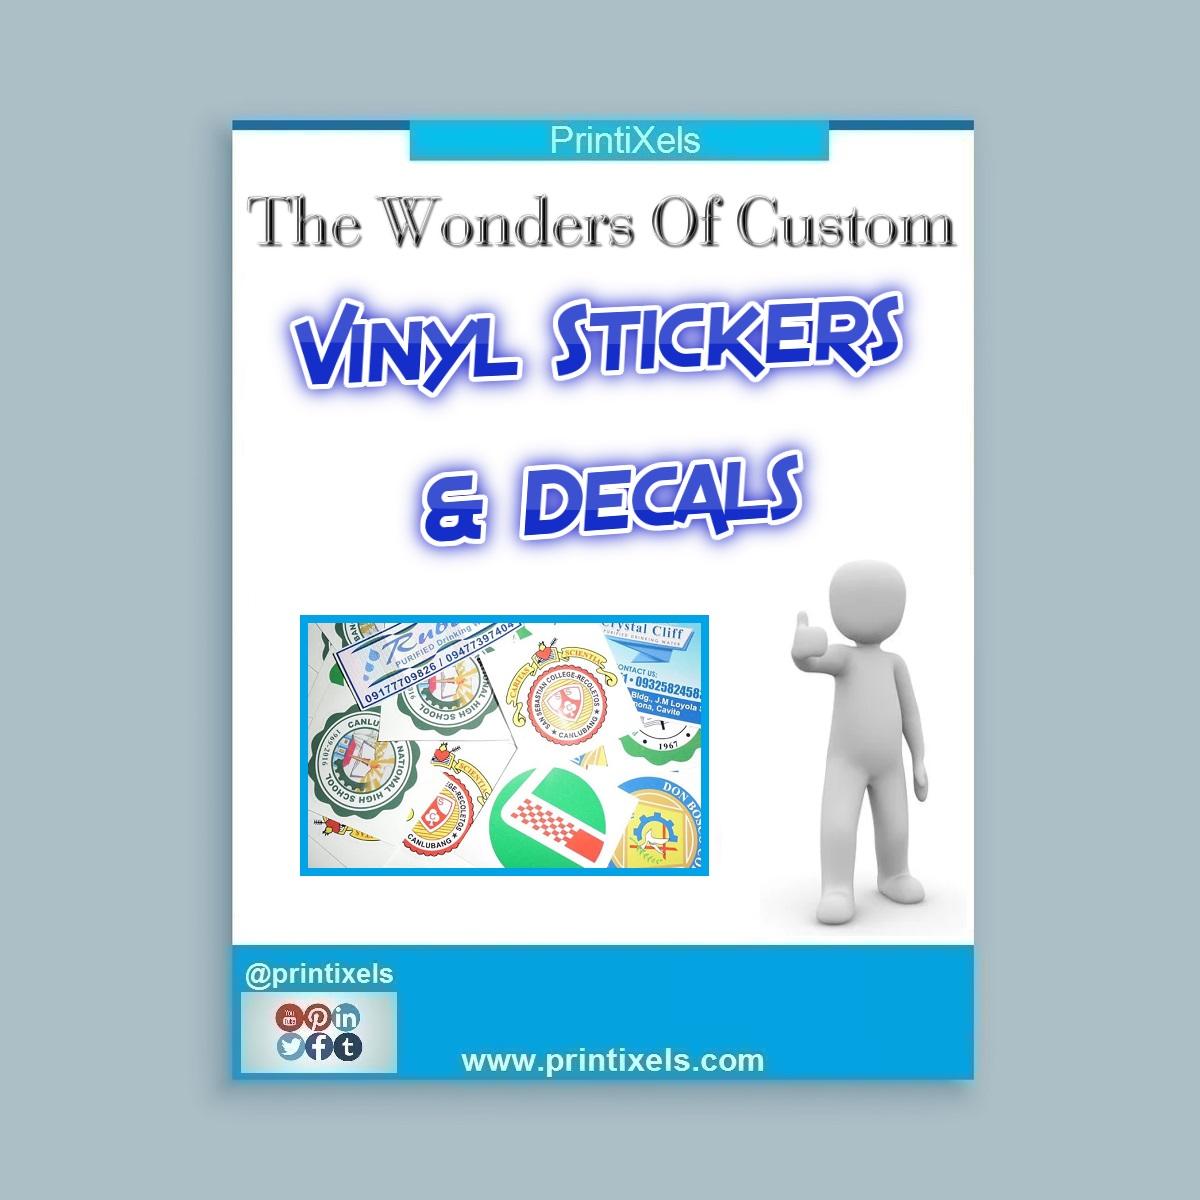 The Wonders Of Custom Vinyl Stickers & Decals